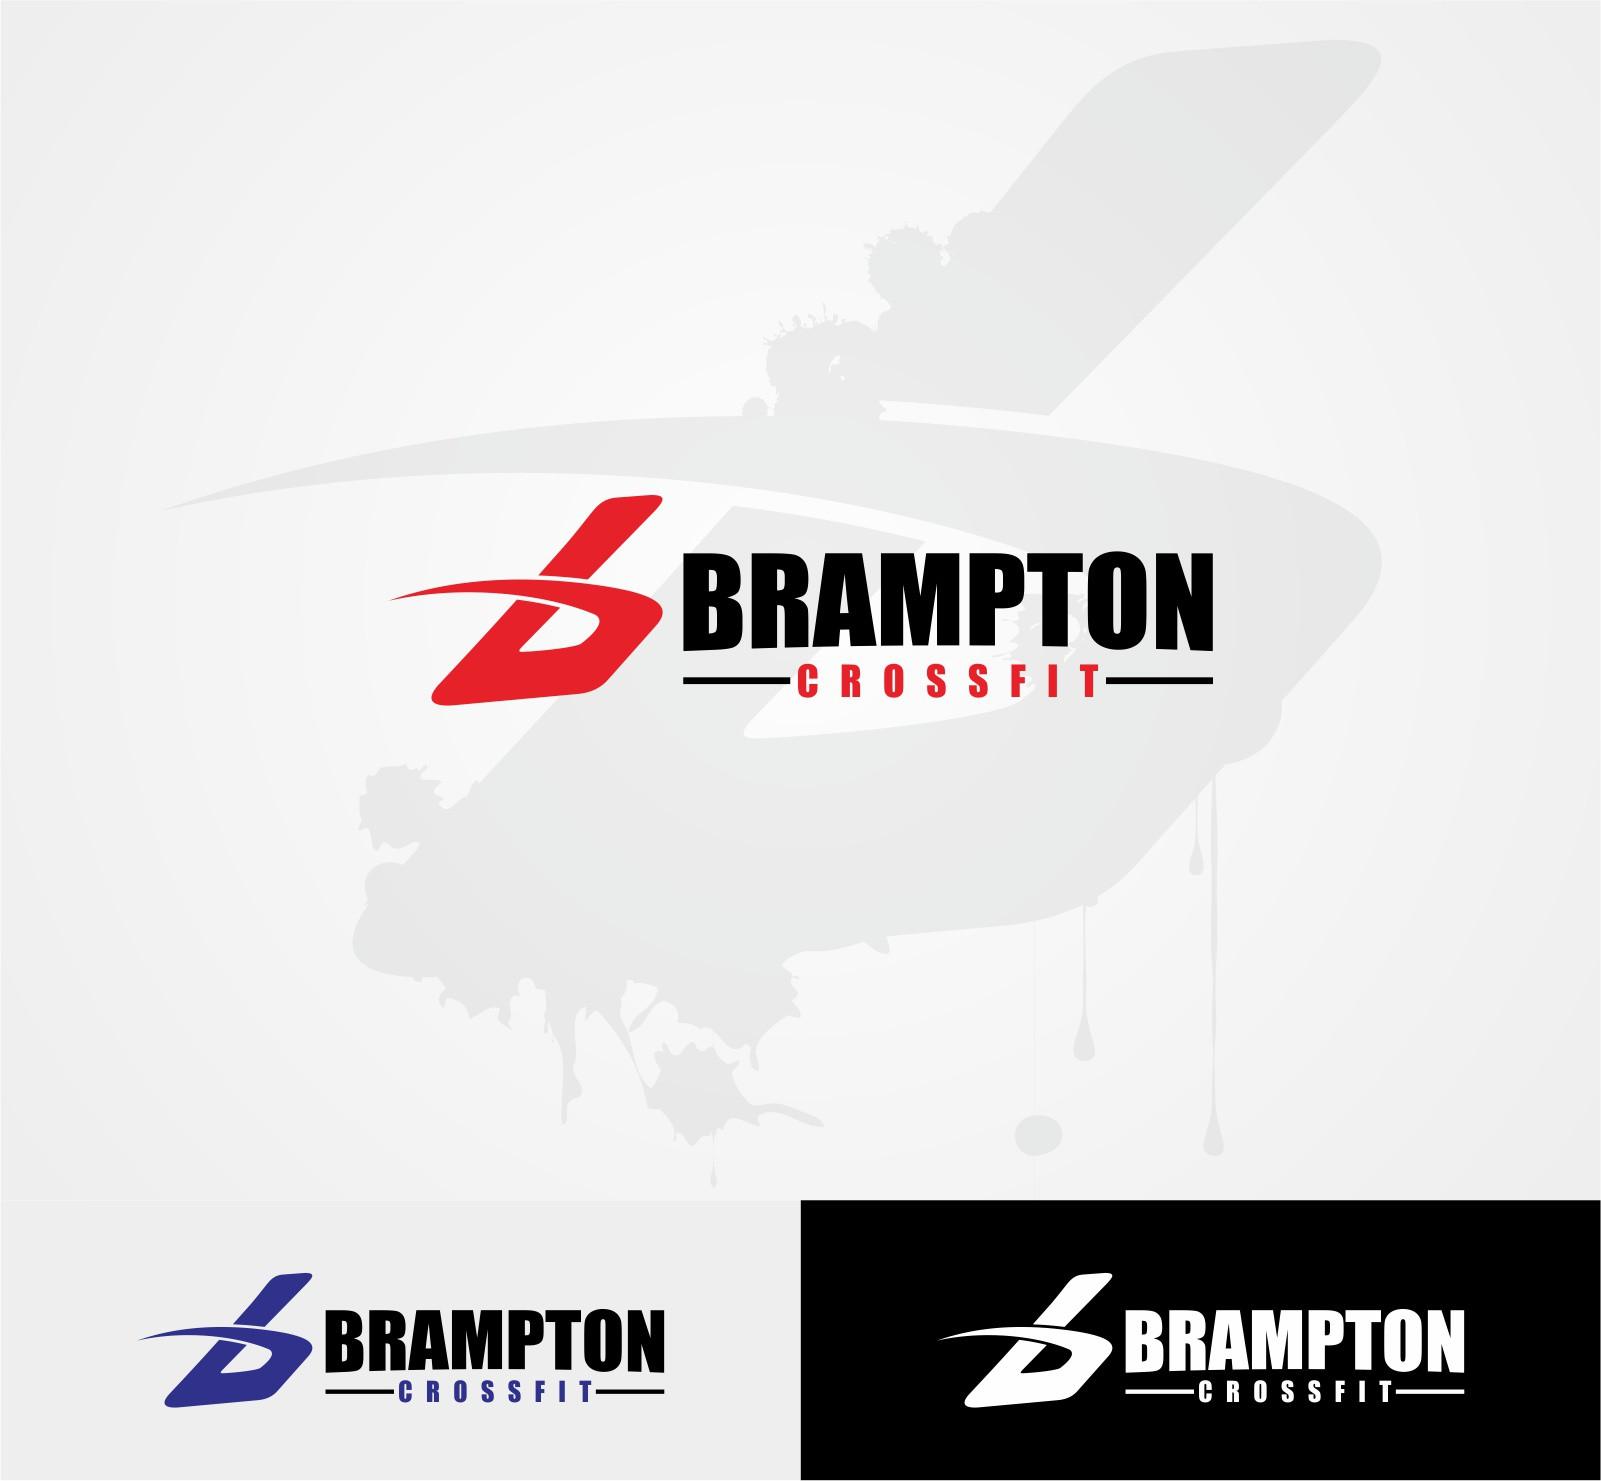 Create a kickass design for Brampton CrossFit